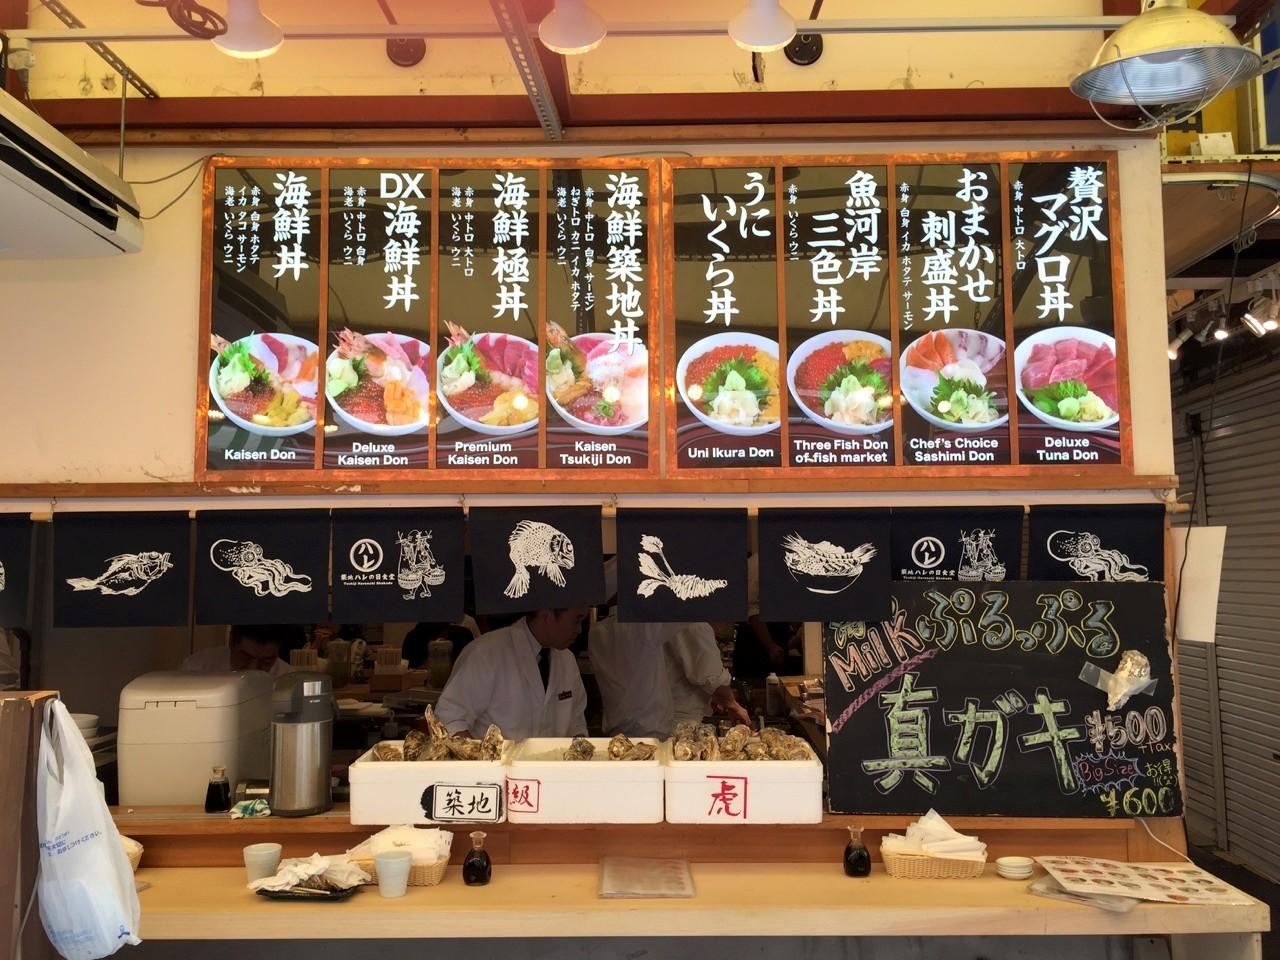 The Tsukiji Market (築地市場)